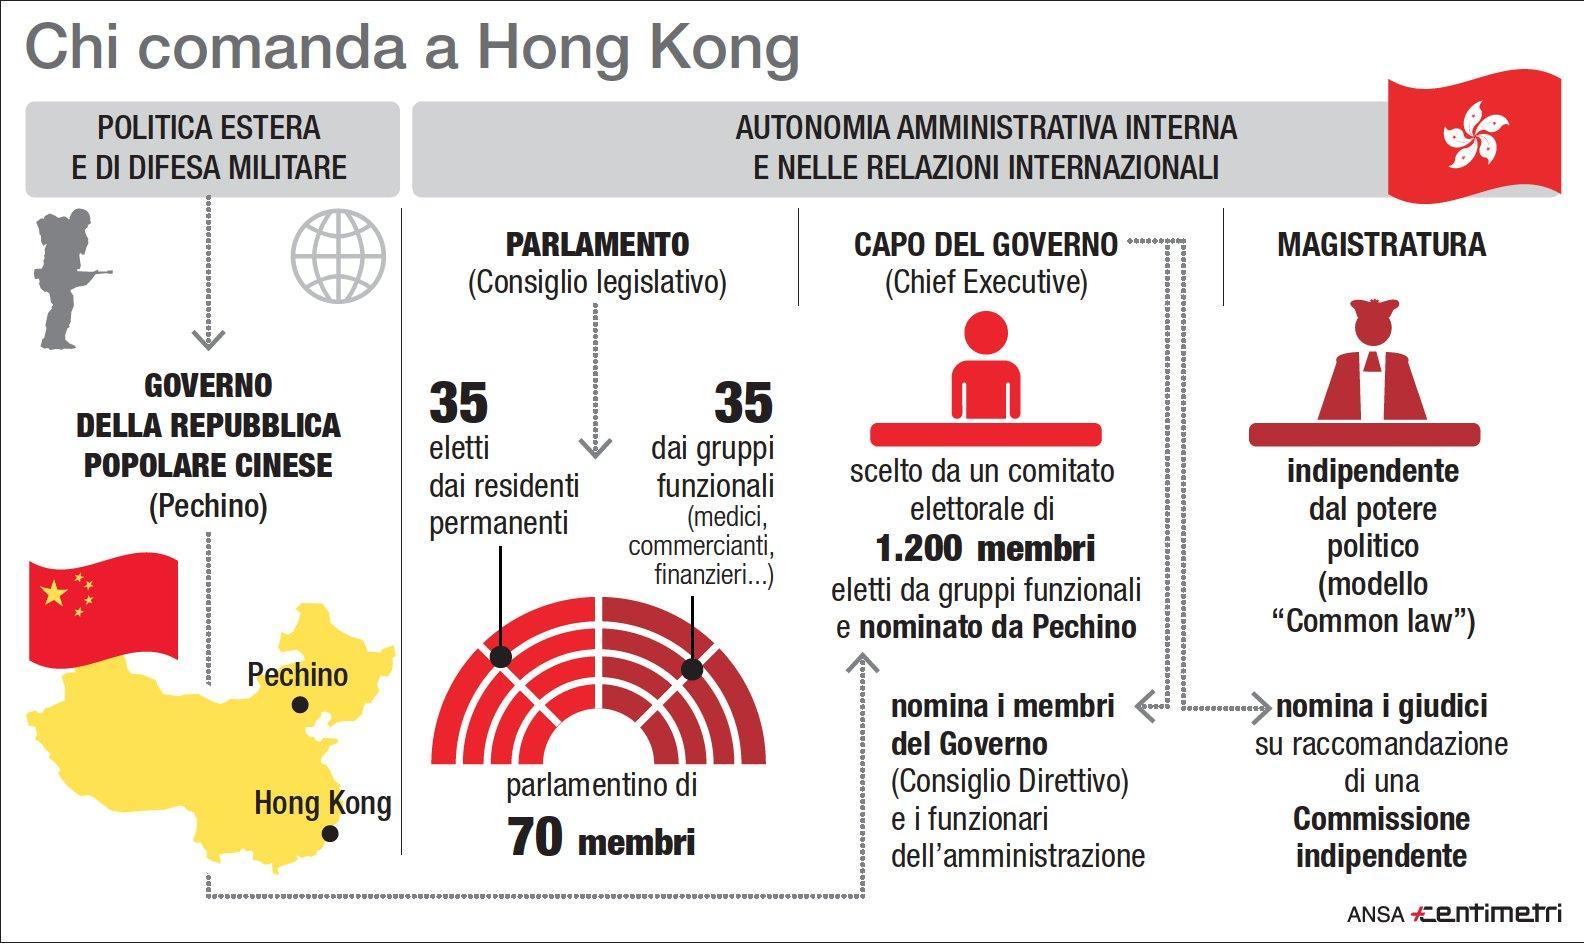 Hong Kong, chi comanda nell ex colonia